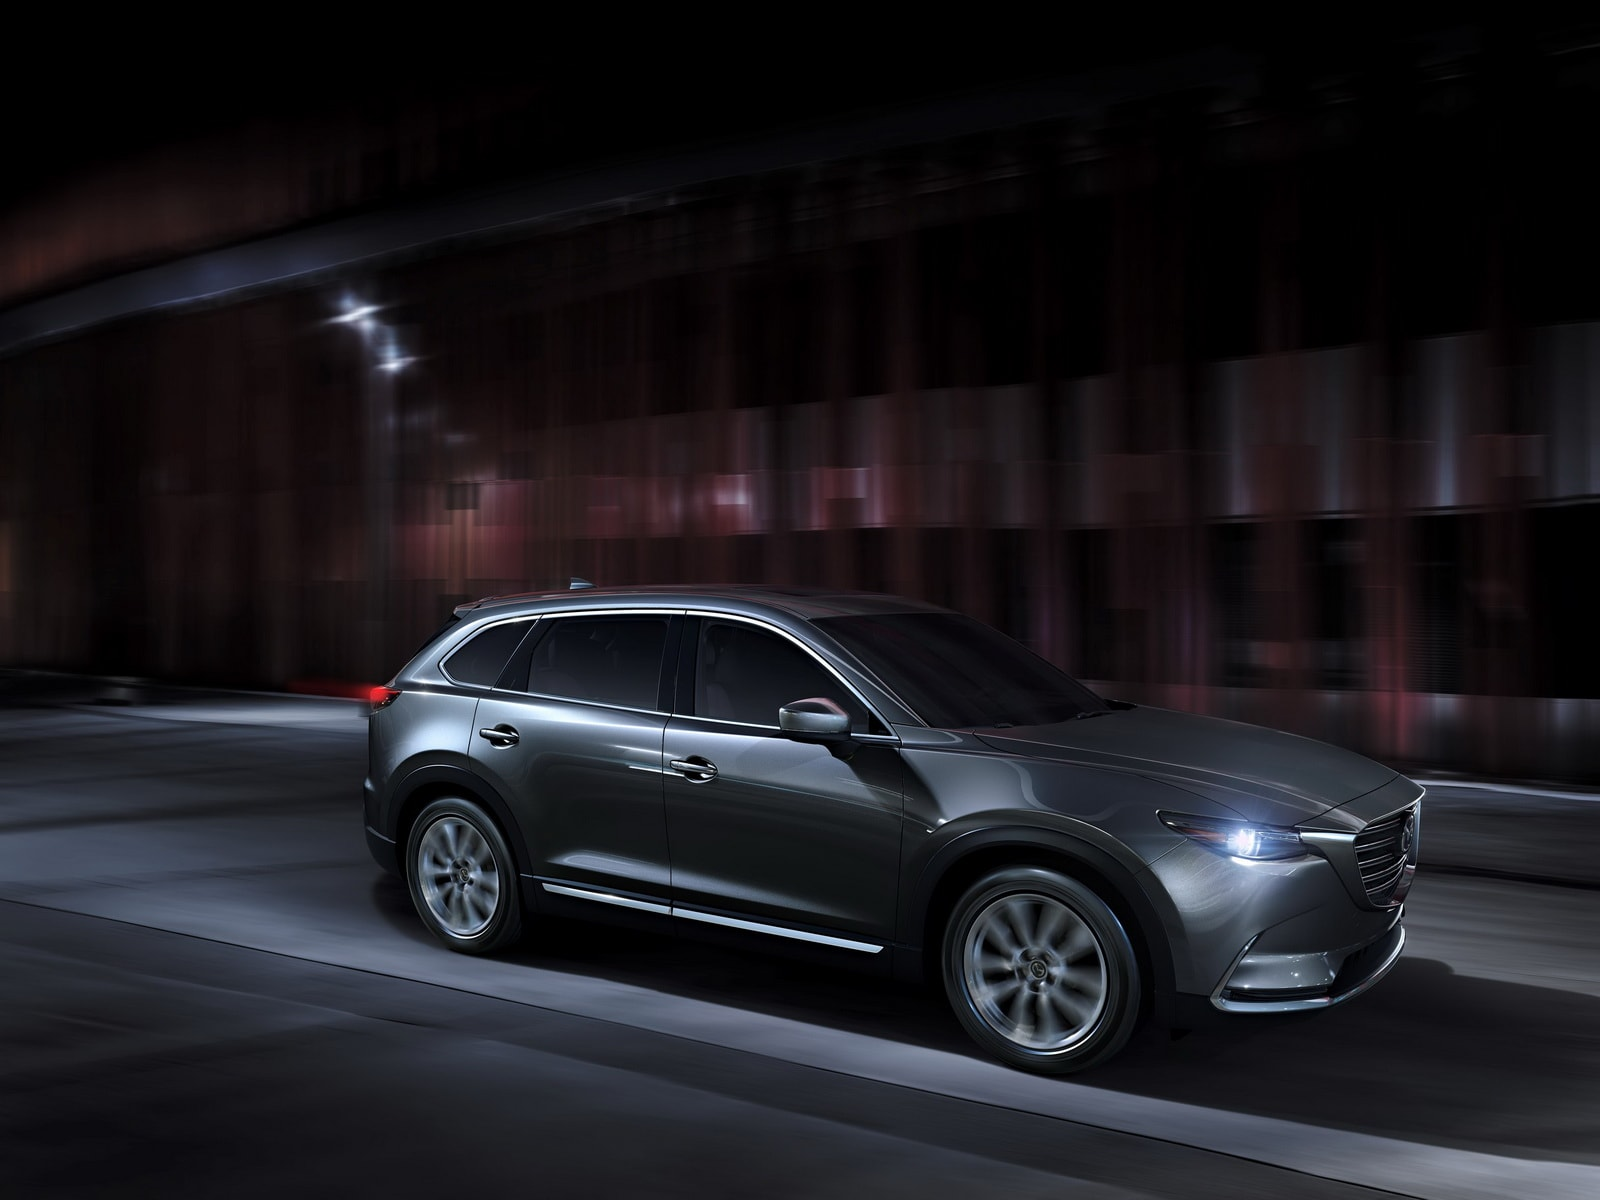 Mazda CX-9 II Widescreen